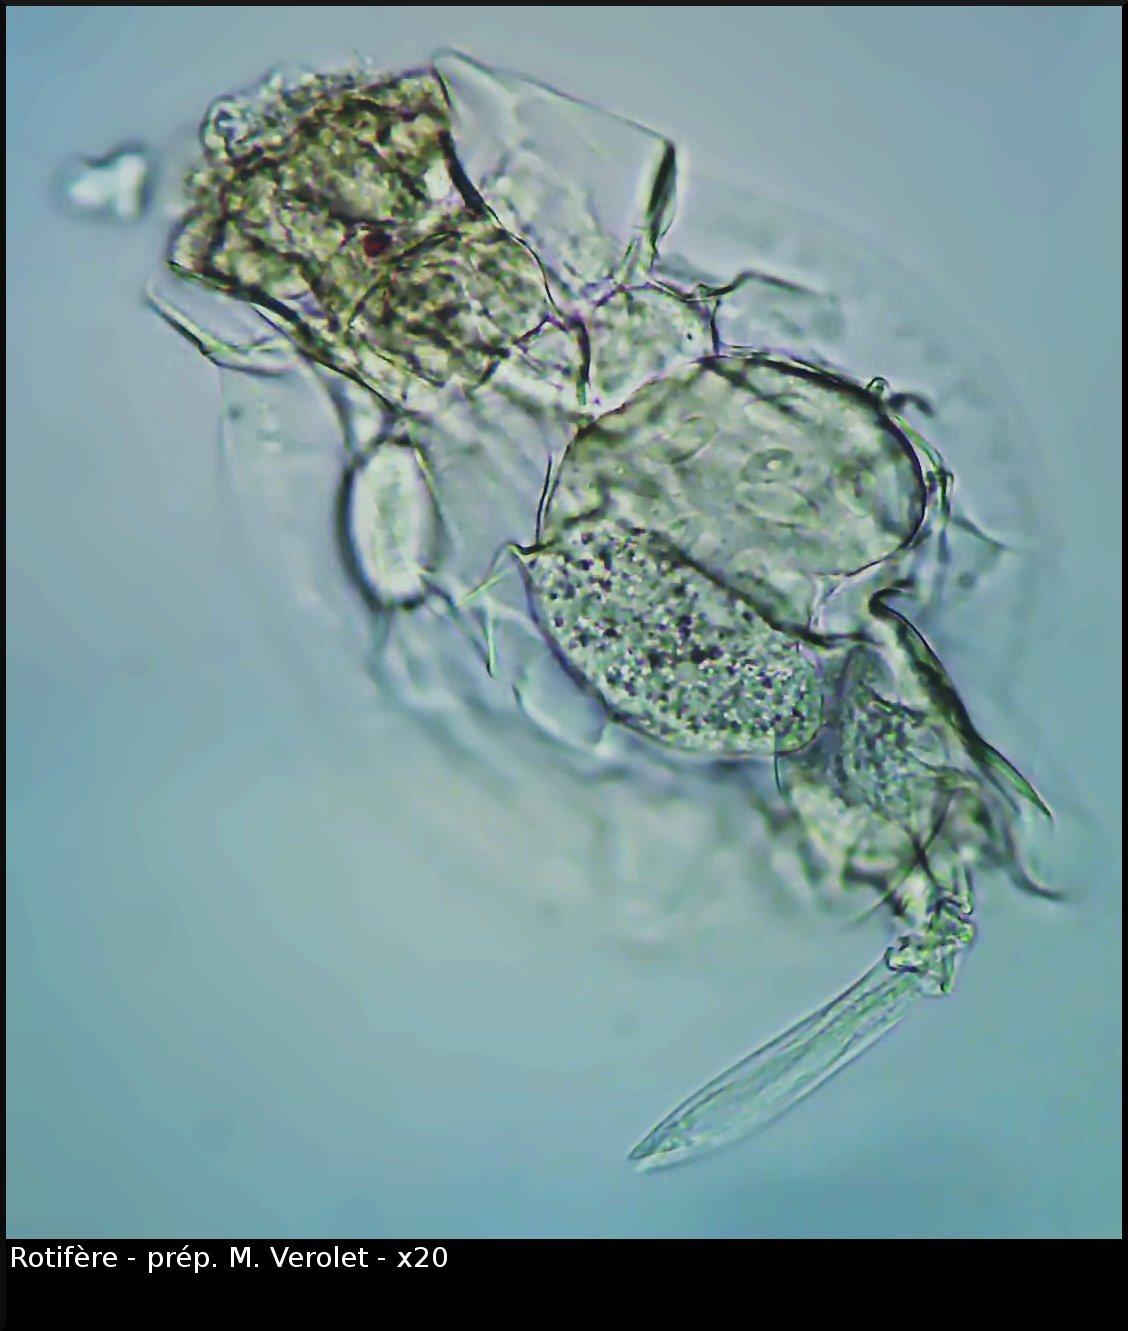 vlc-rotifere-0610-00144.jpg